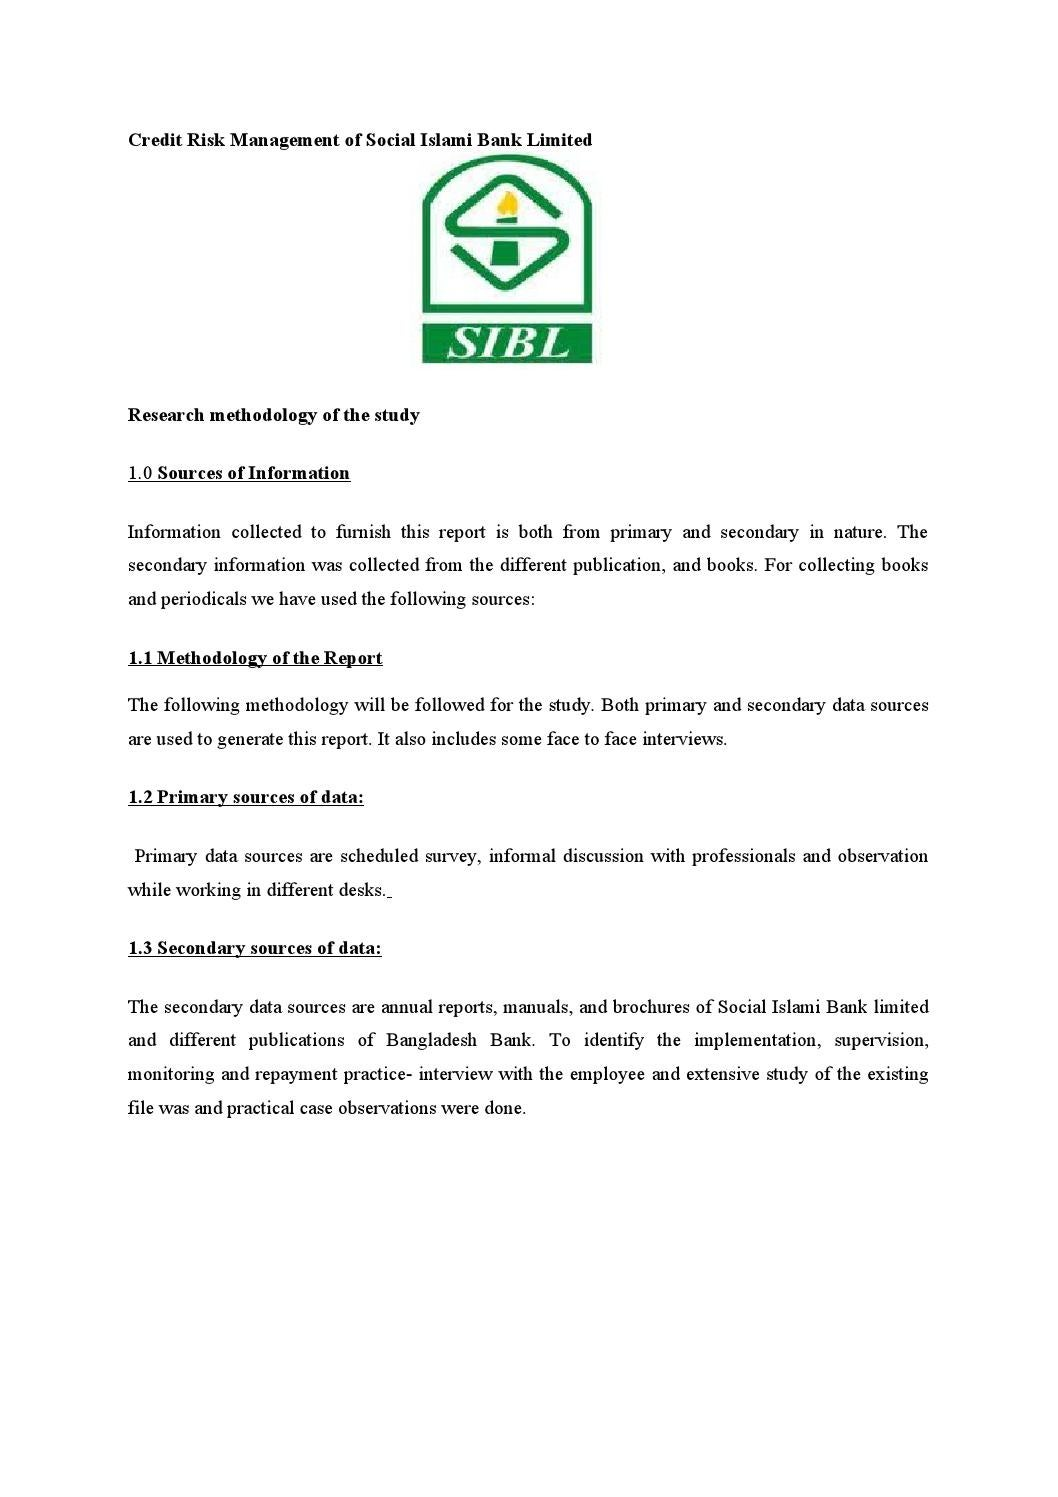 Credit risk management of social islami bank limited by md papon credit risk management of social islami bank limited by md papon issuu 1betcityfo Images